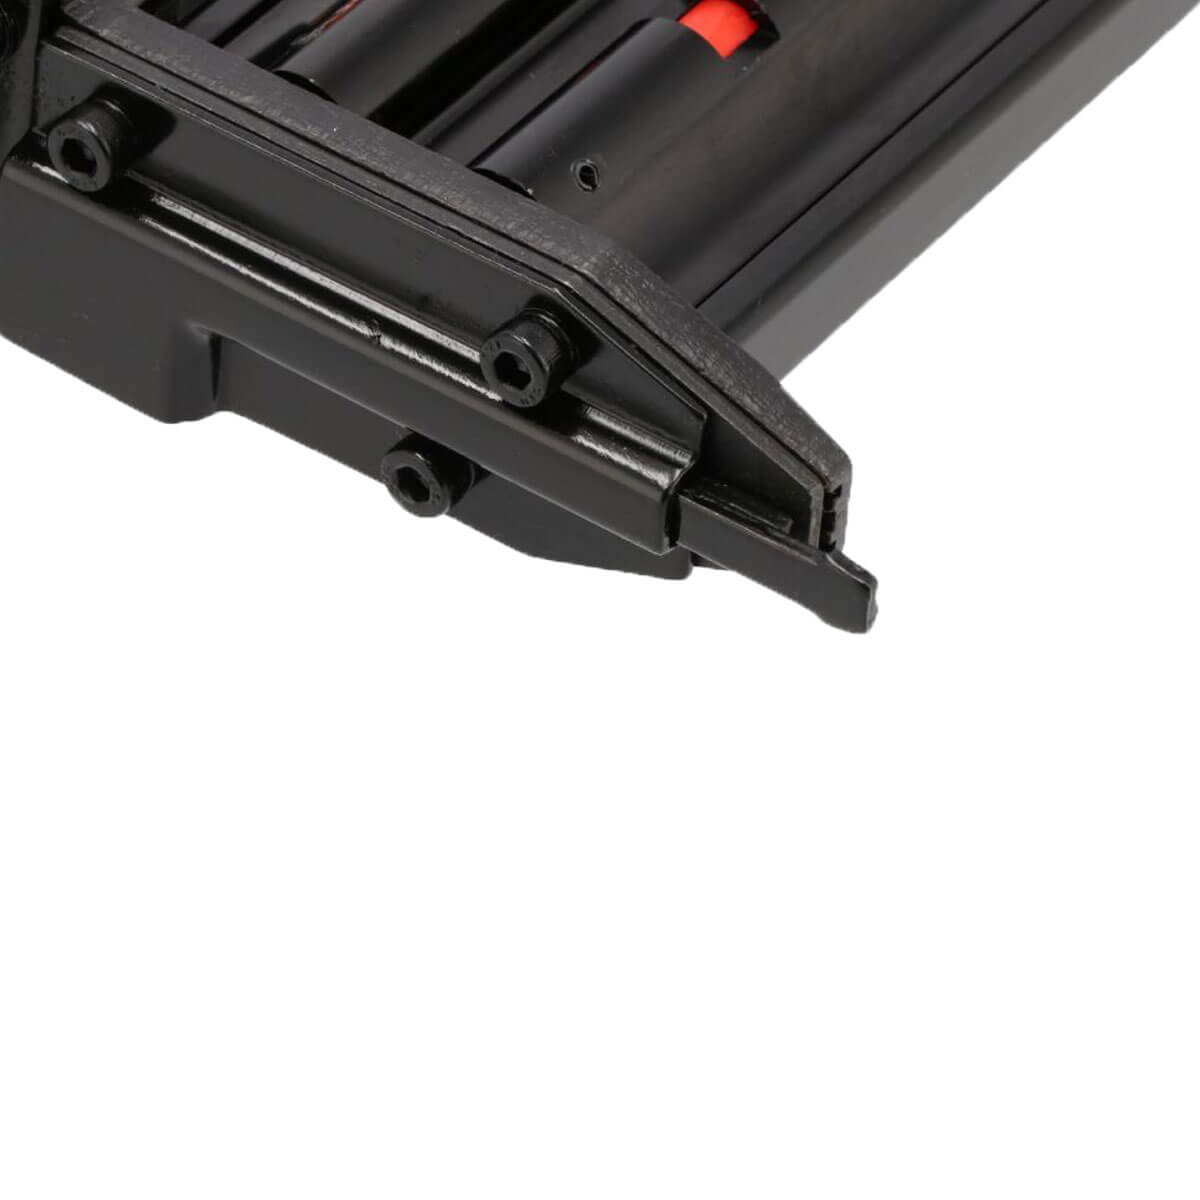 Pneumatische Spijkermachine minibrads t/m 50 mm minibrads inbegrepen neus beveiliging nietjes